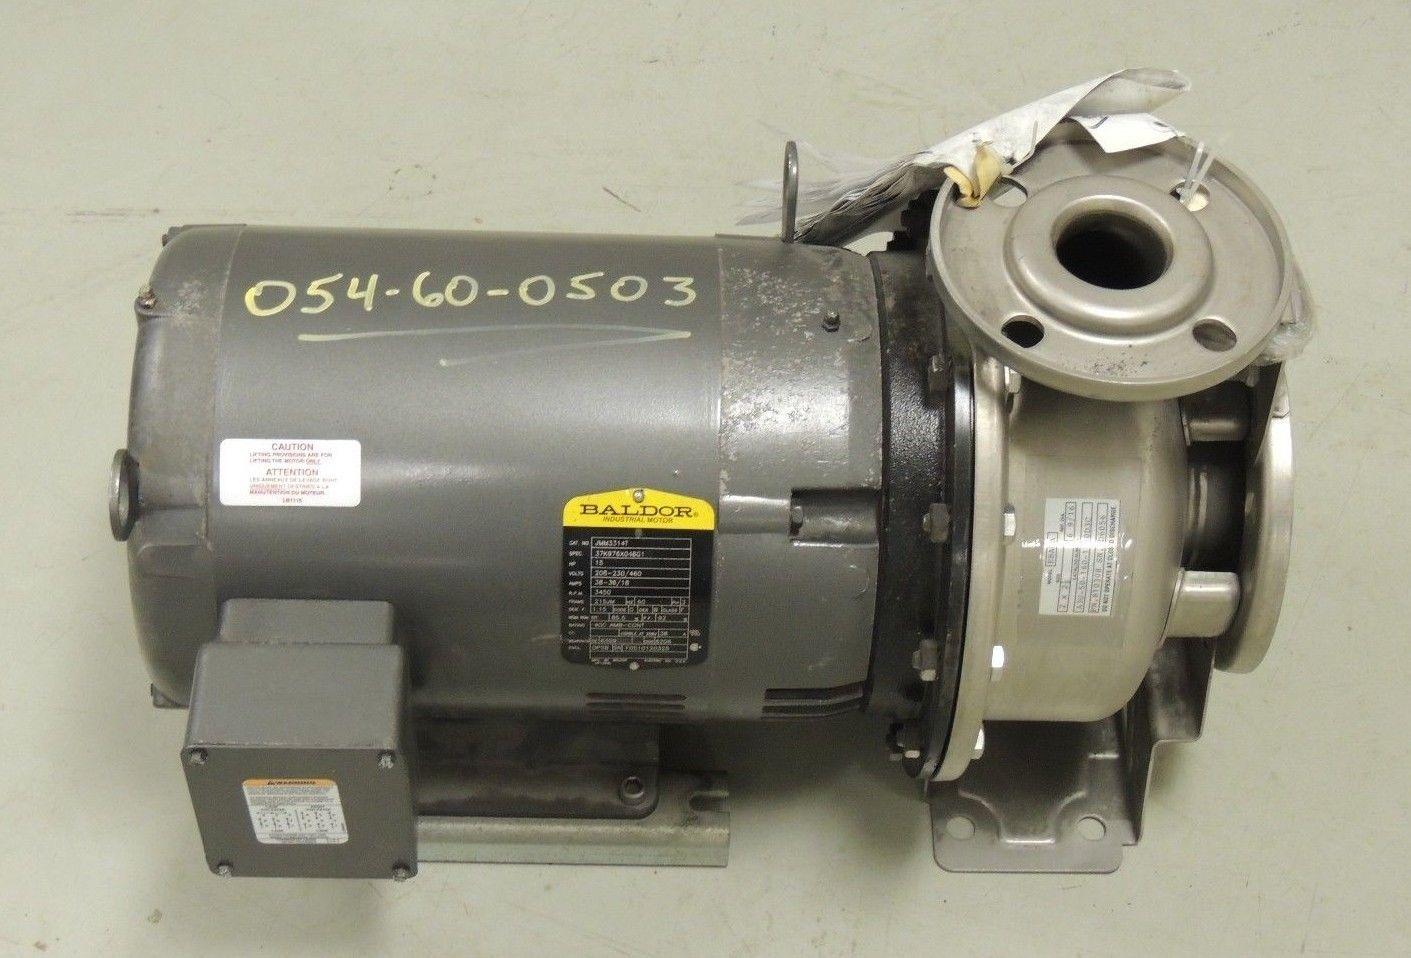 New ebara centrifugal pump with baldor motor a3u 50 160 Baldor industrial motor pump